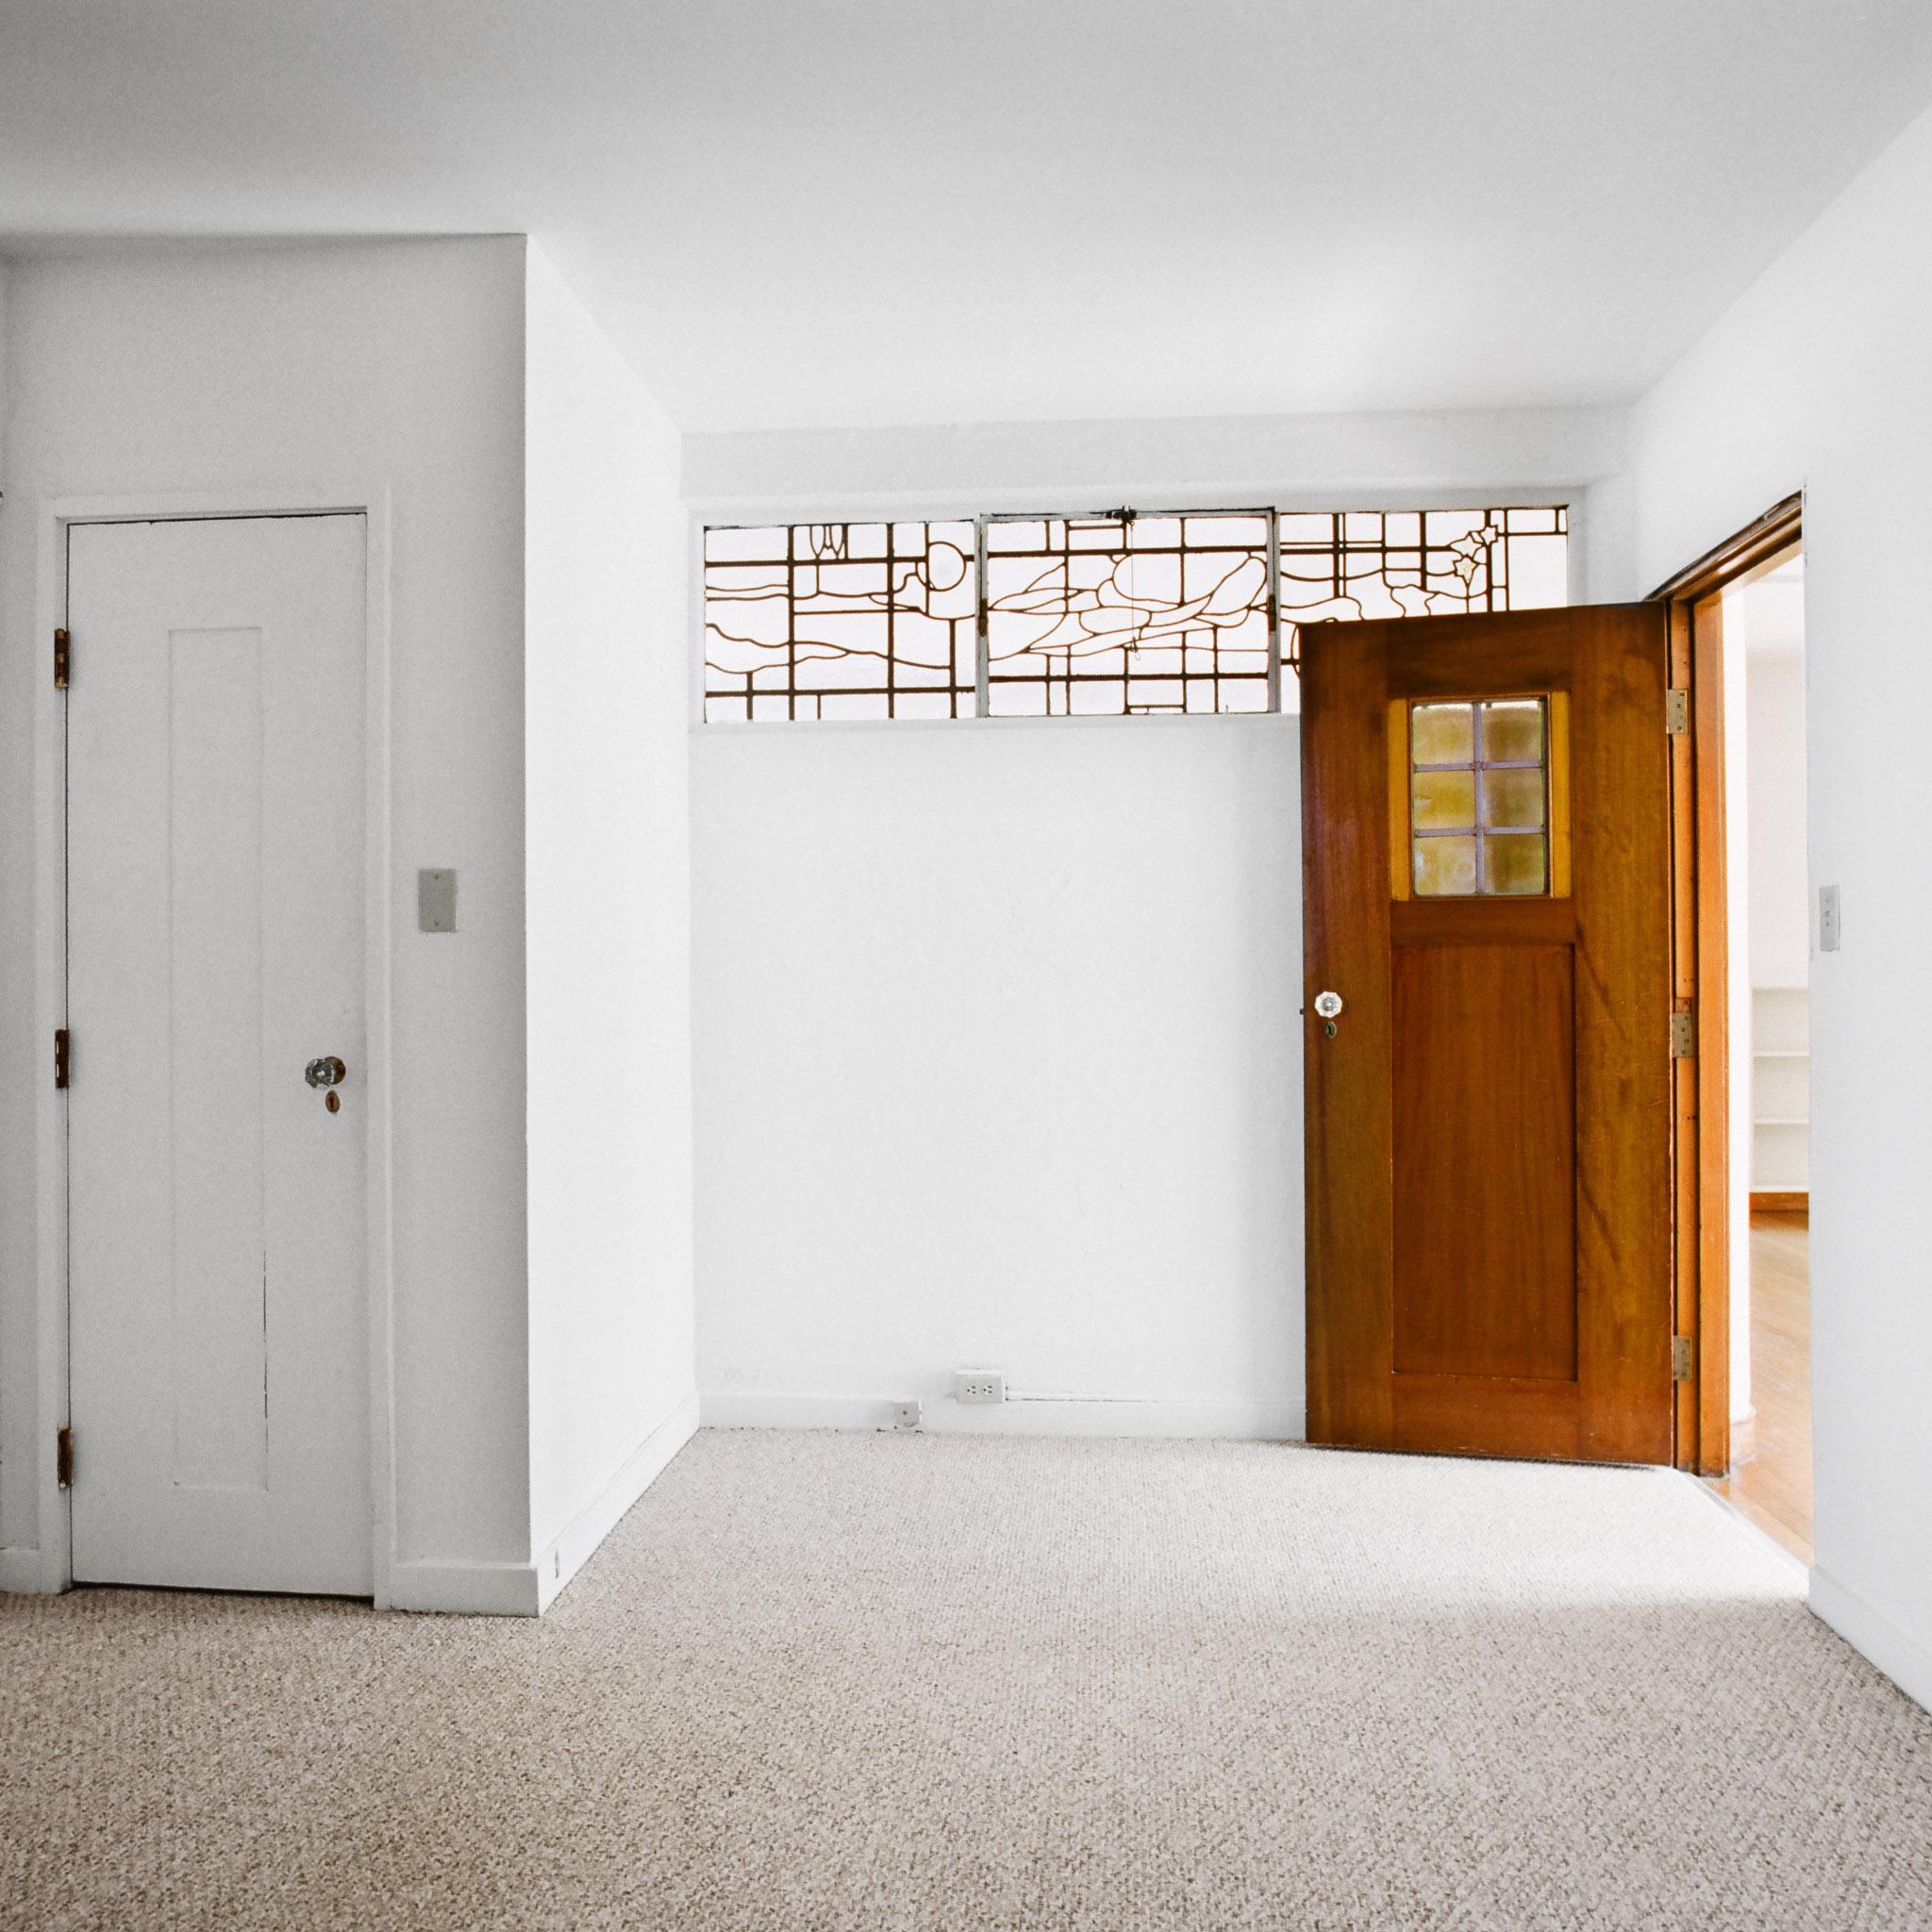 interior of 340 S. Highland Ave, Apt. 5A 6